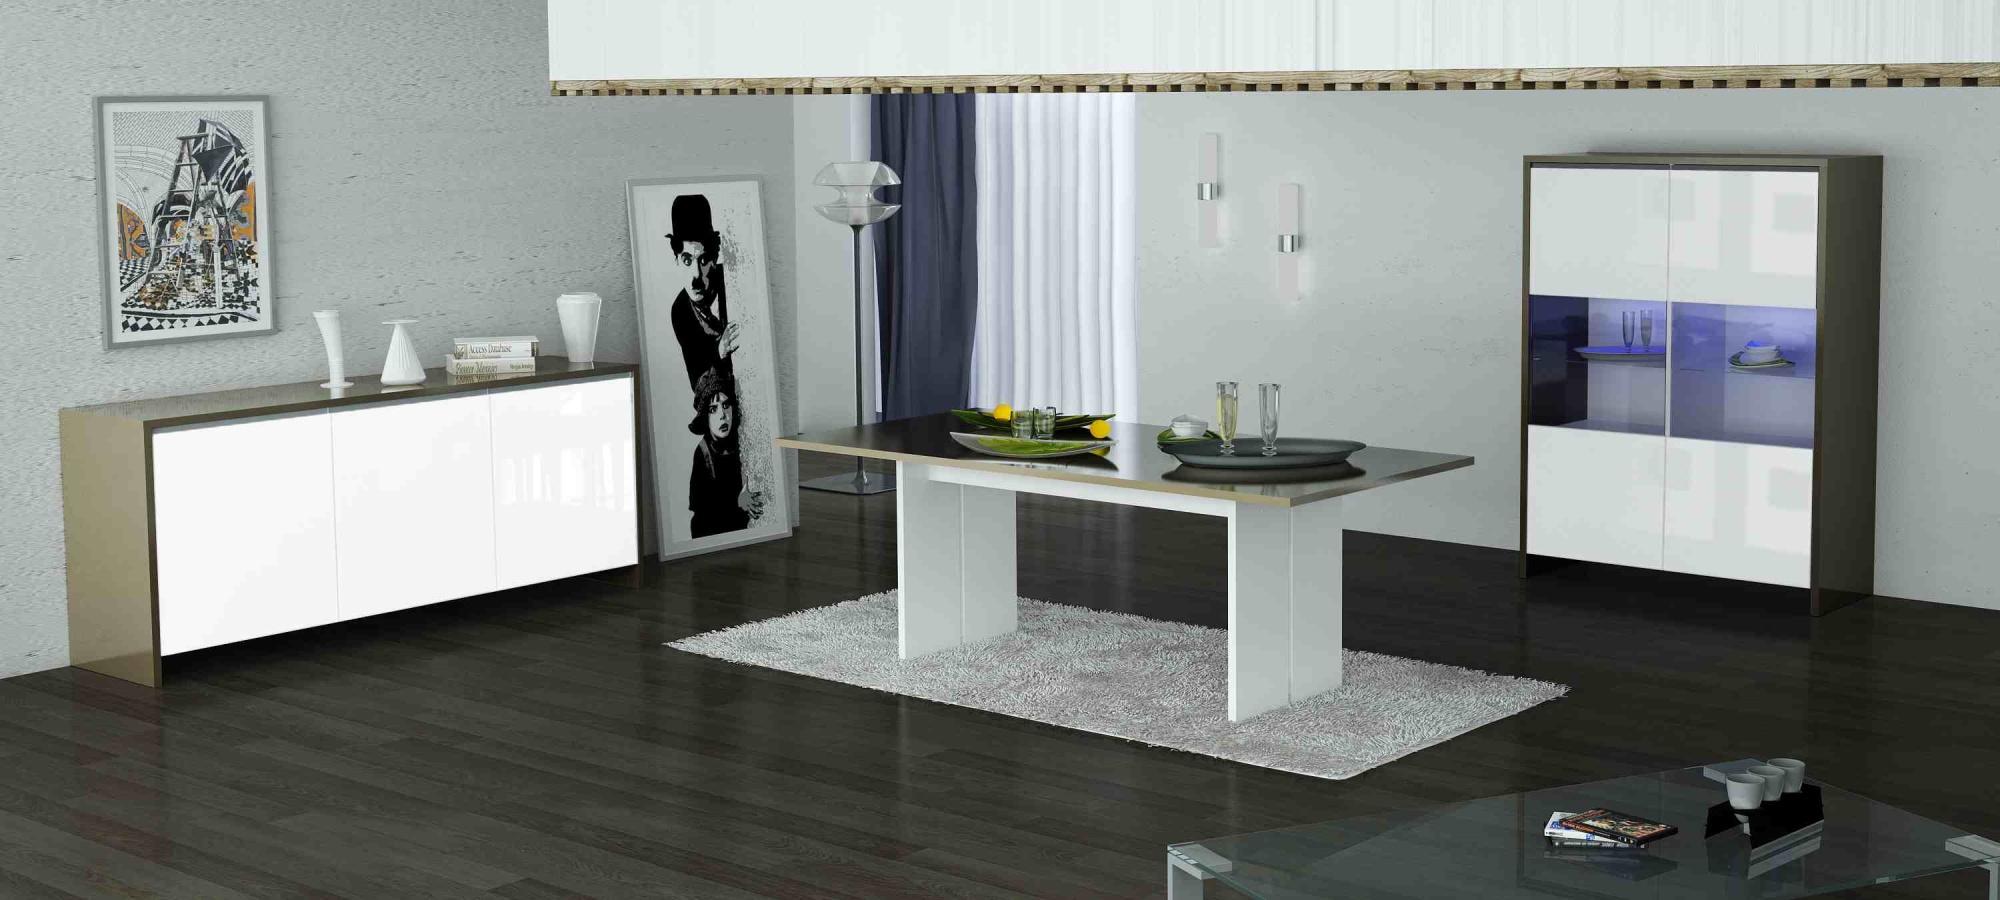 table de salle manger design laqu e blanche cappuccino kalie. Black Bedroom Furniture Sets. Home Design Ideas